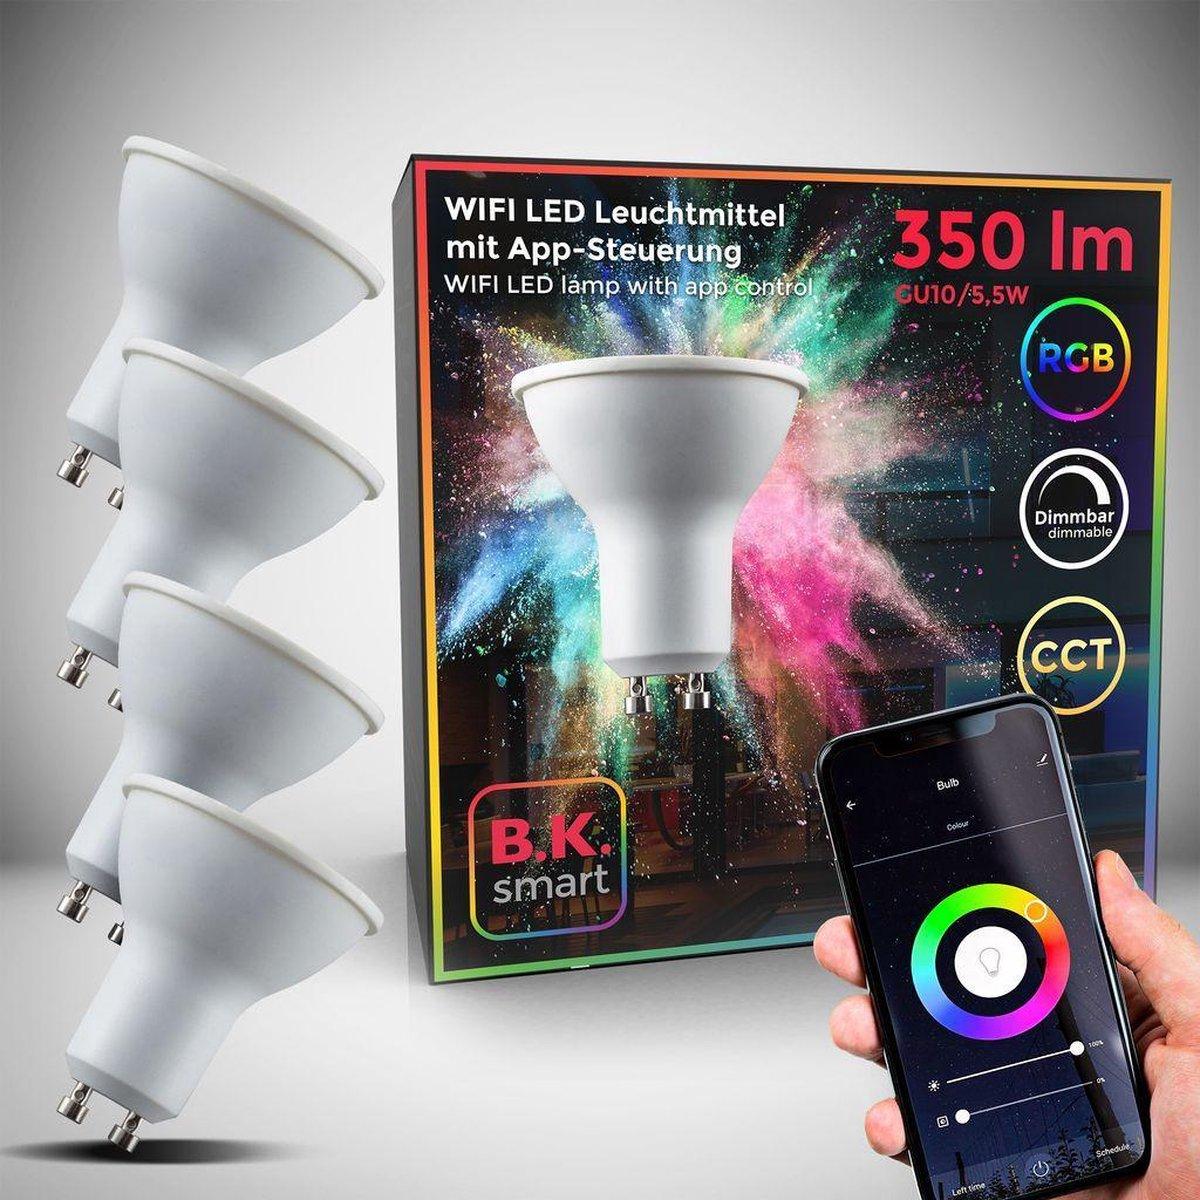 B.K.Licht - Slimme Lichtbron - RGB en CCT - set van 4 - smart lamp - met GU10 - 5.5W LED - WiFi - App - 2.700K to 6.500K - 350 Lm - voice control - color lampjes - LED lamp